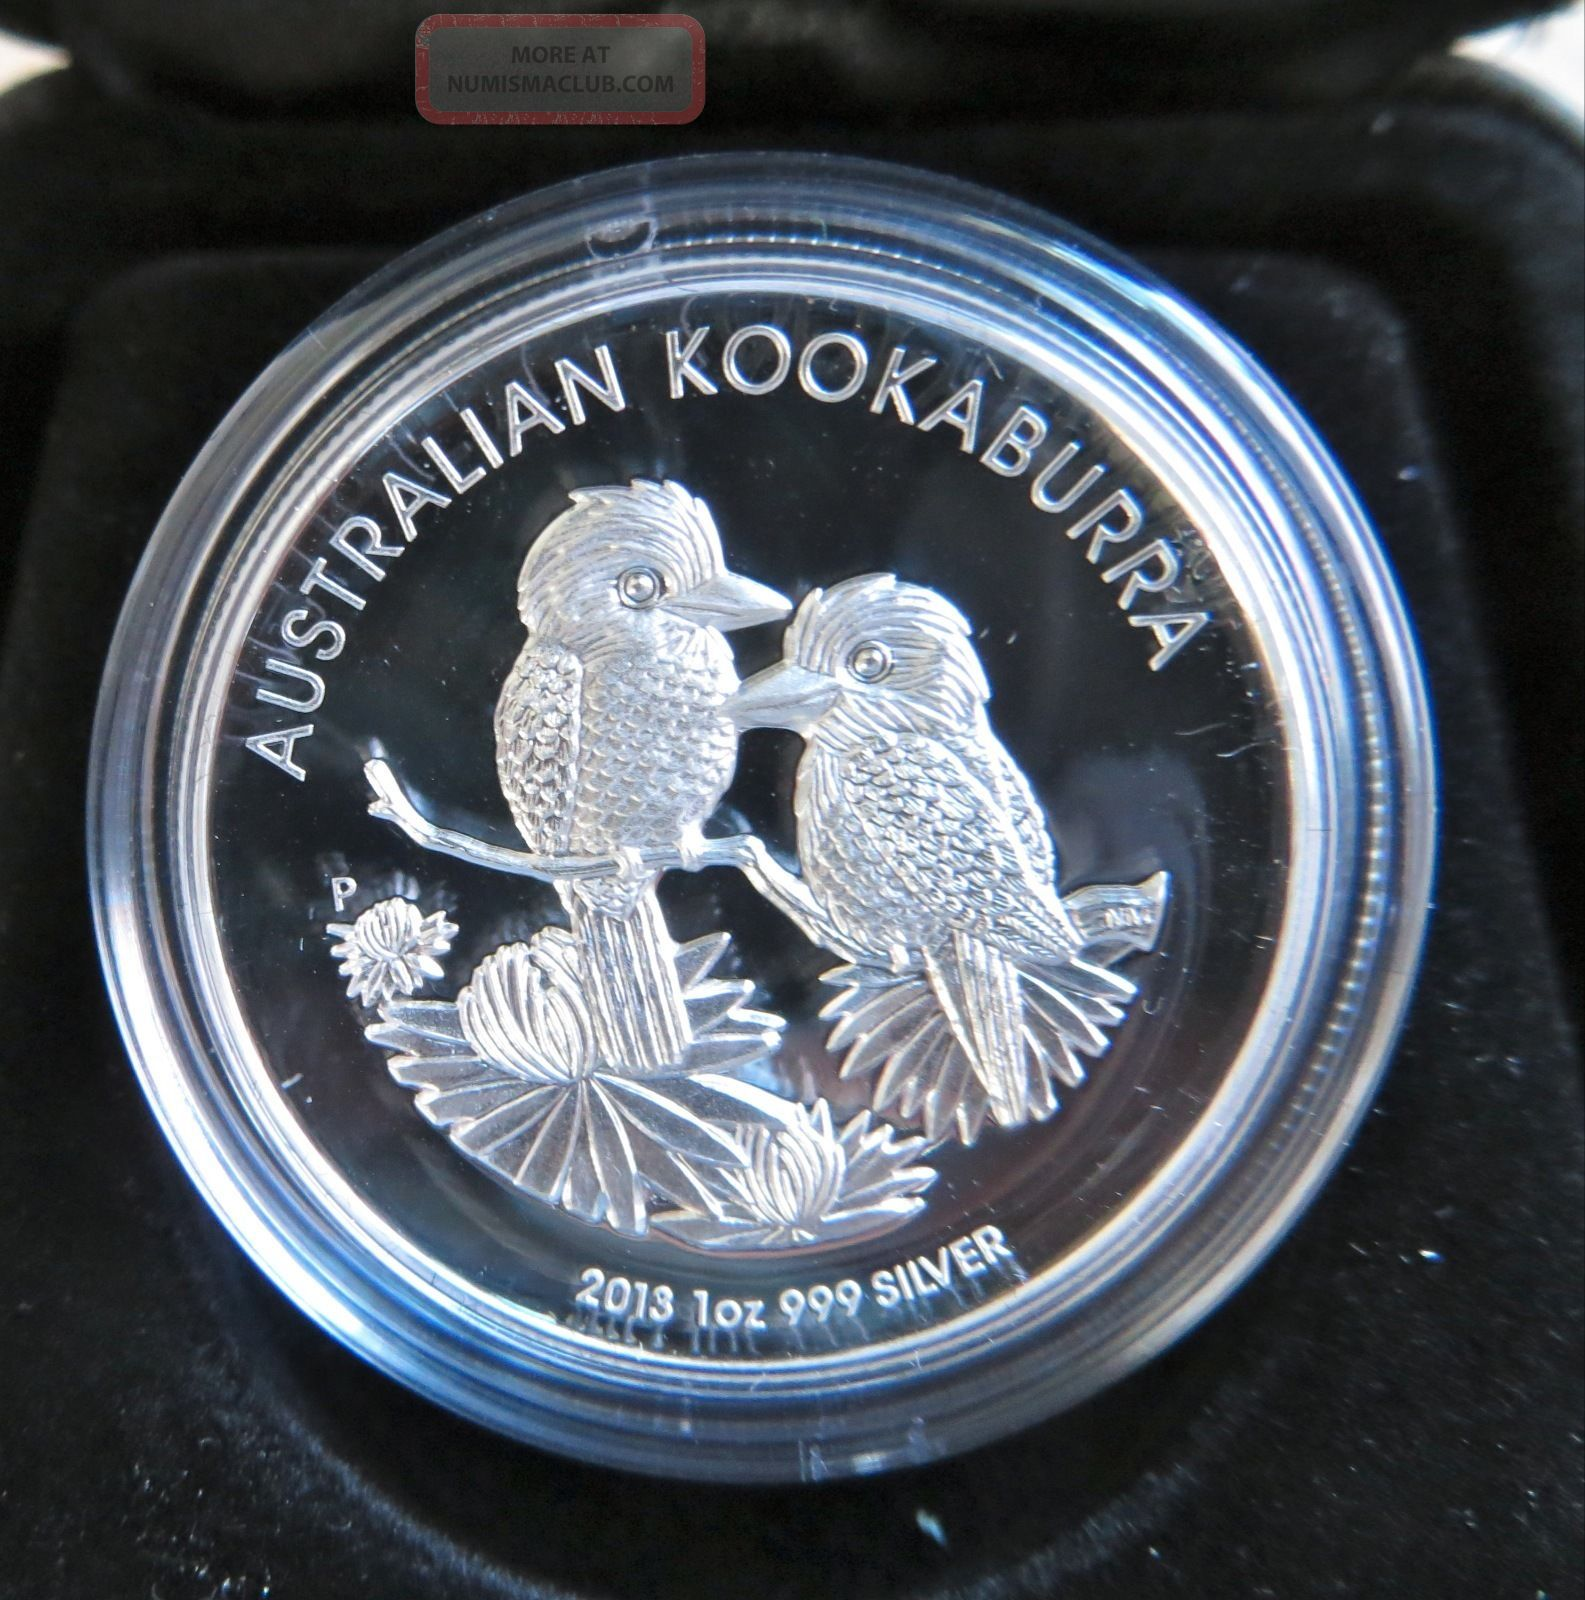 2013 Australian 1oz Silver High Relief Kookaburra Unc